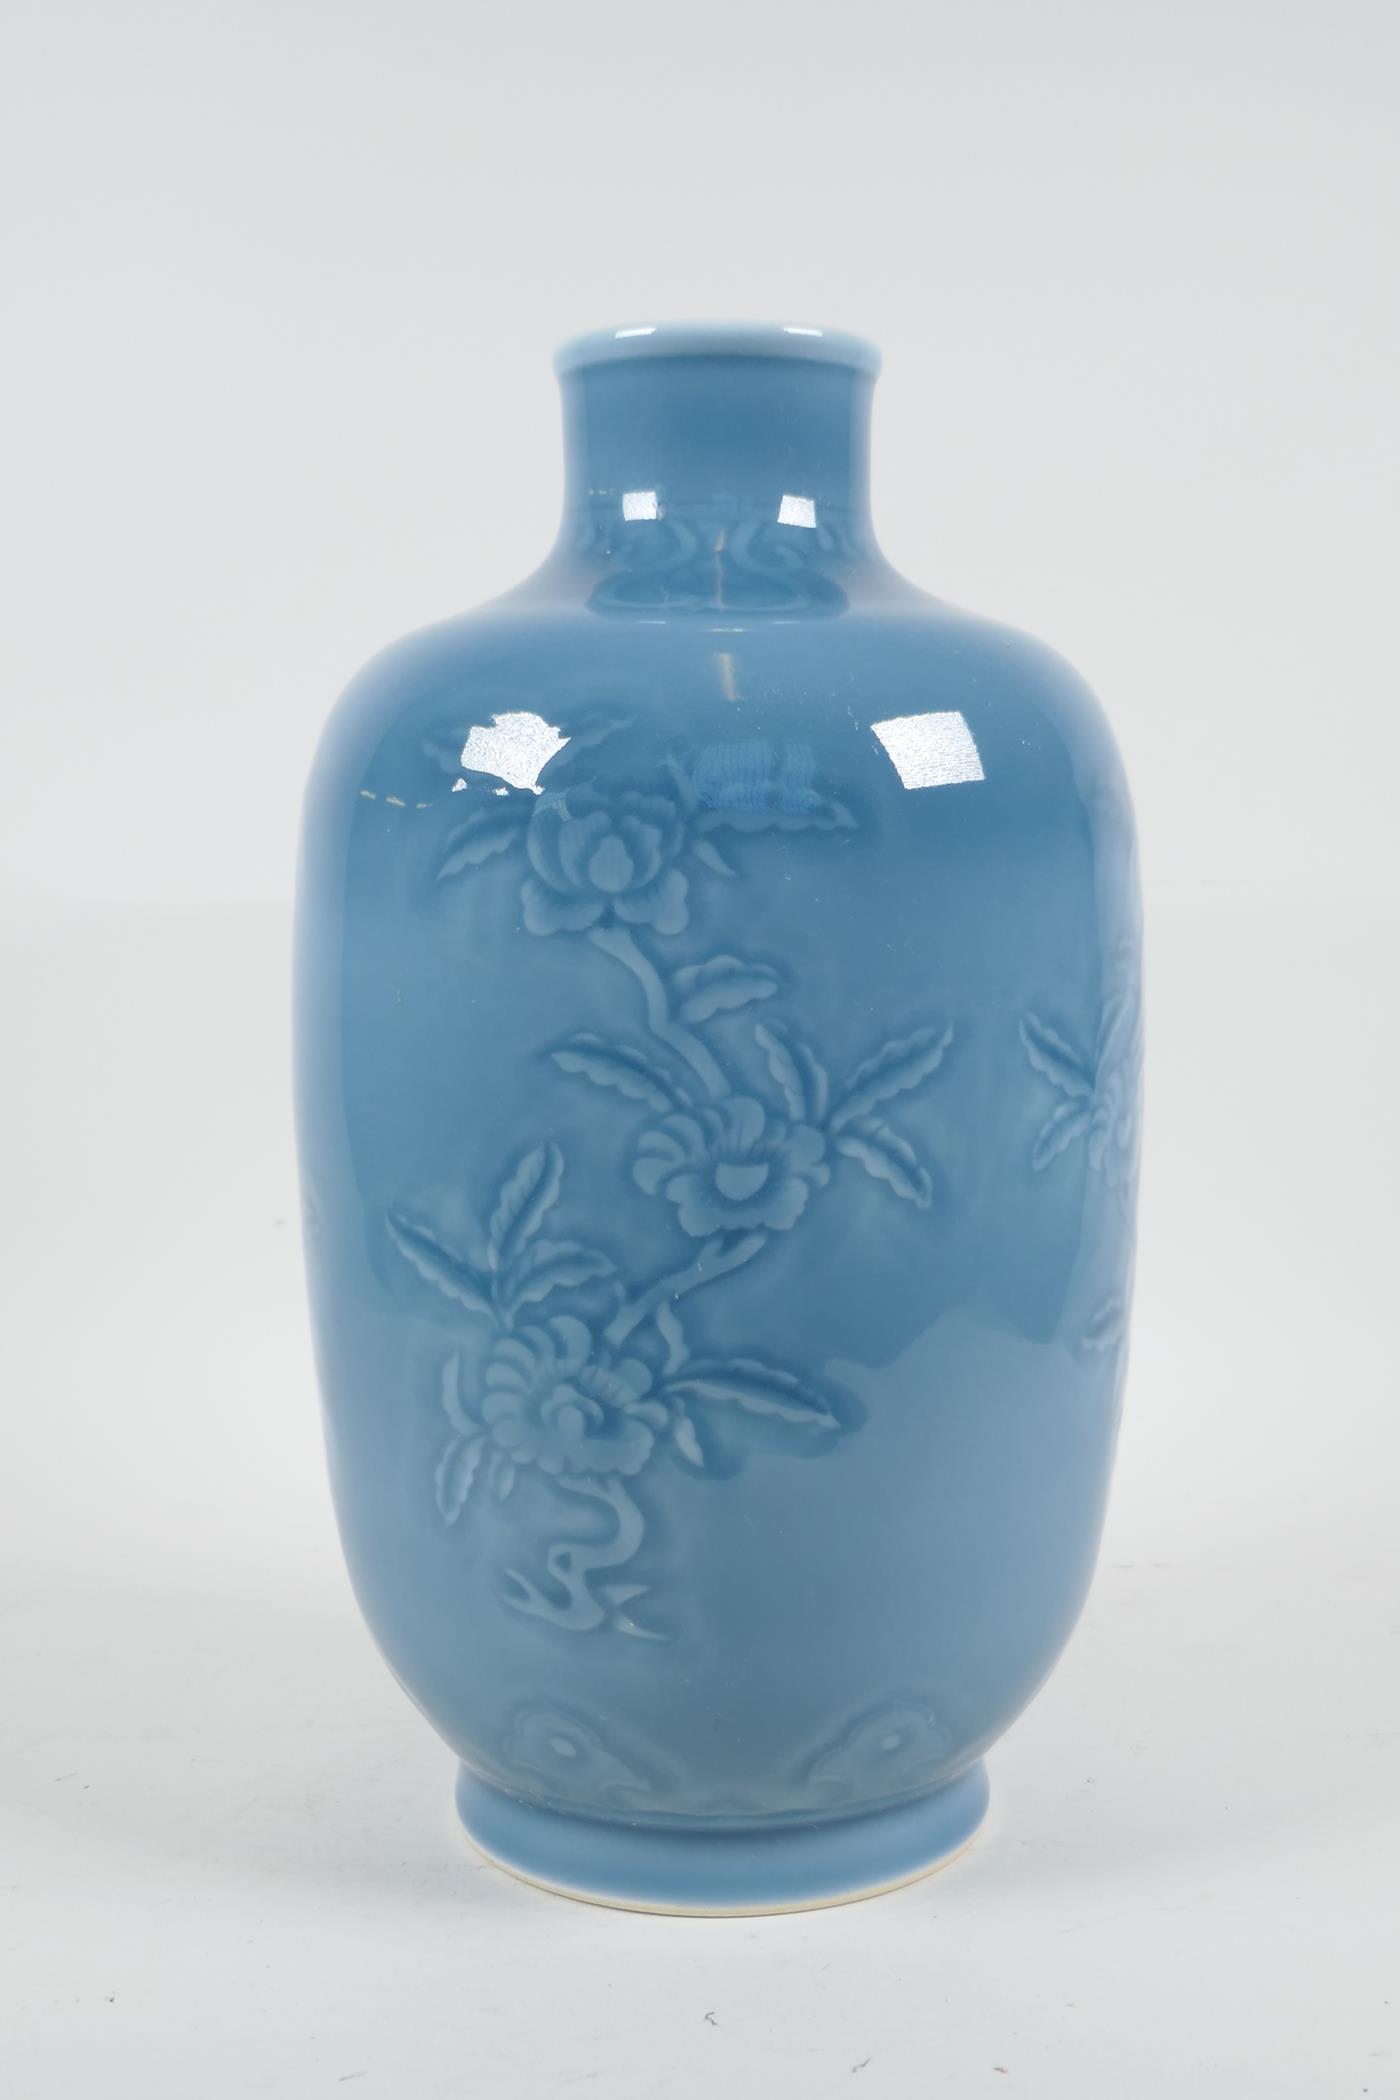 "A Chinese blue glazed porcelain vase with underglaze floral decoration, seal mark to base, 11"" high"